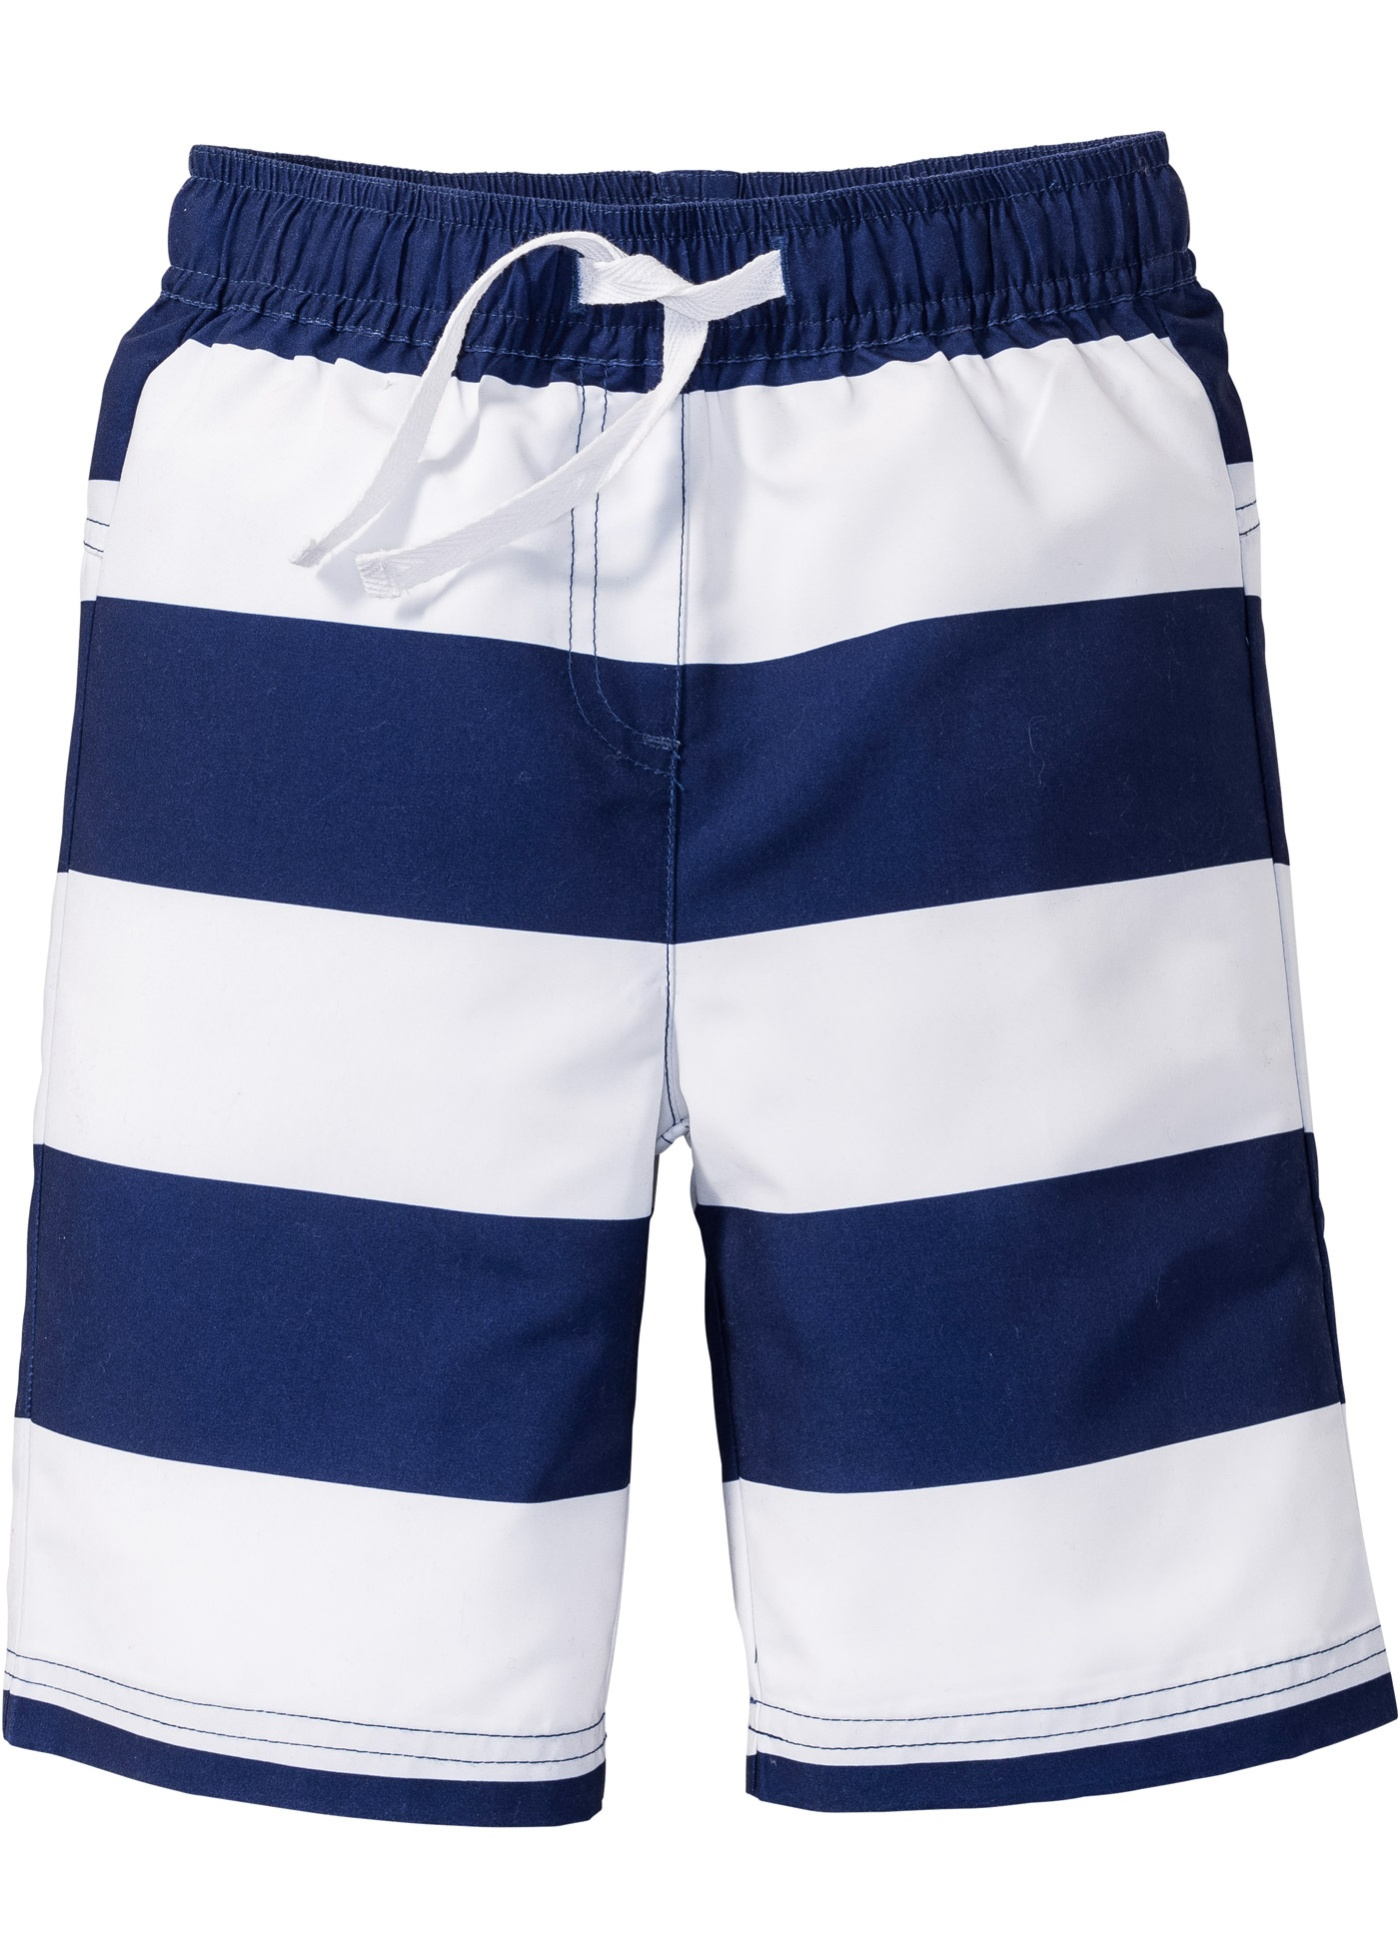 Pantaloncino  Blu  - bpc